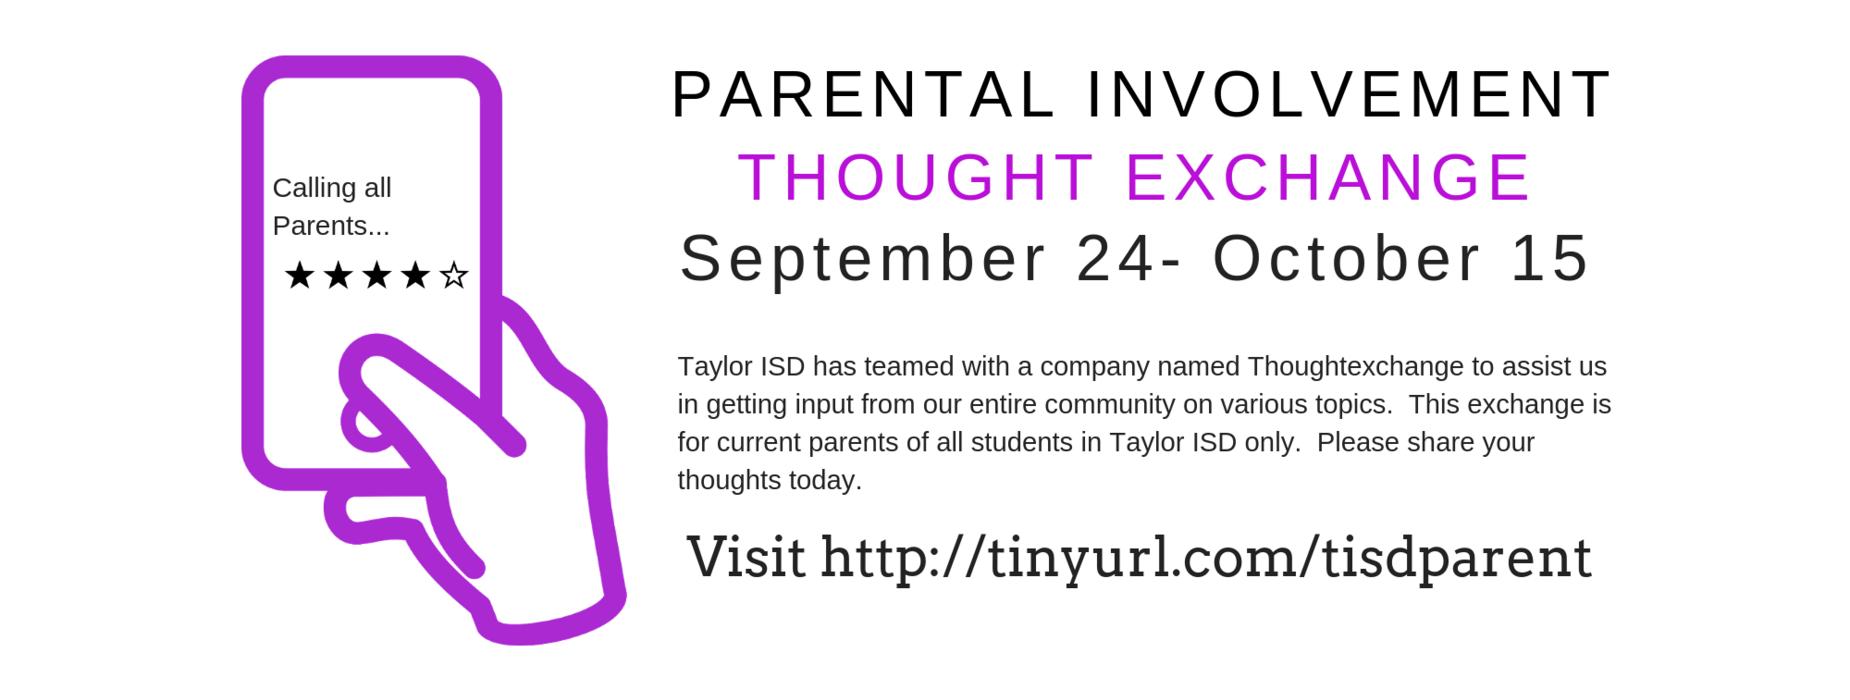 Parental Involvement- Thought Exchange